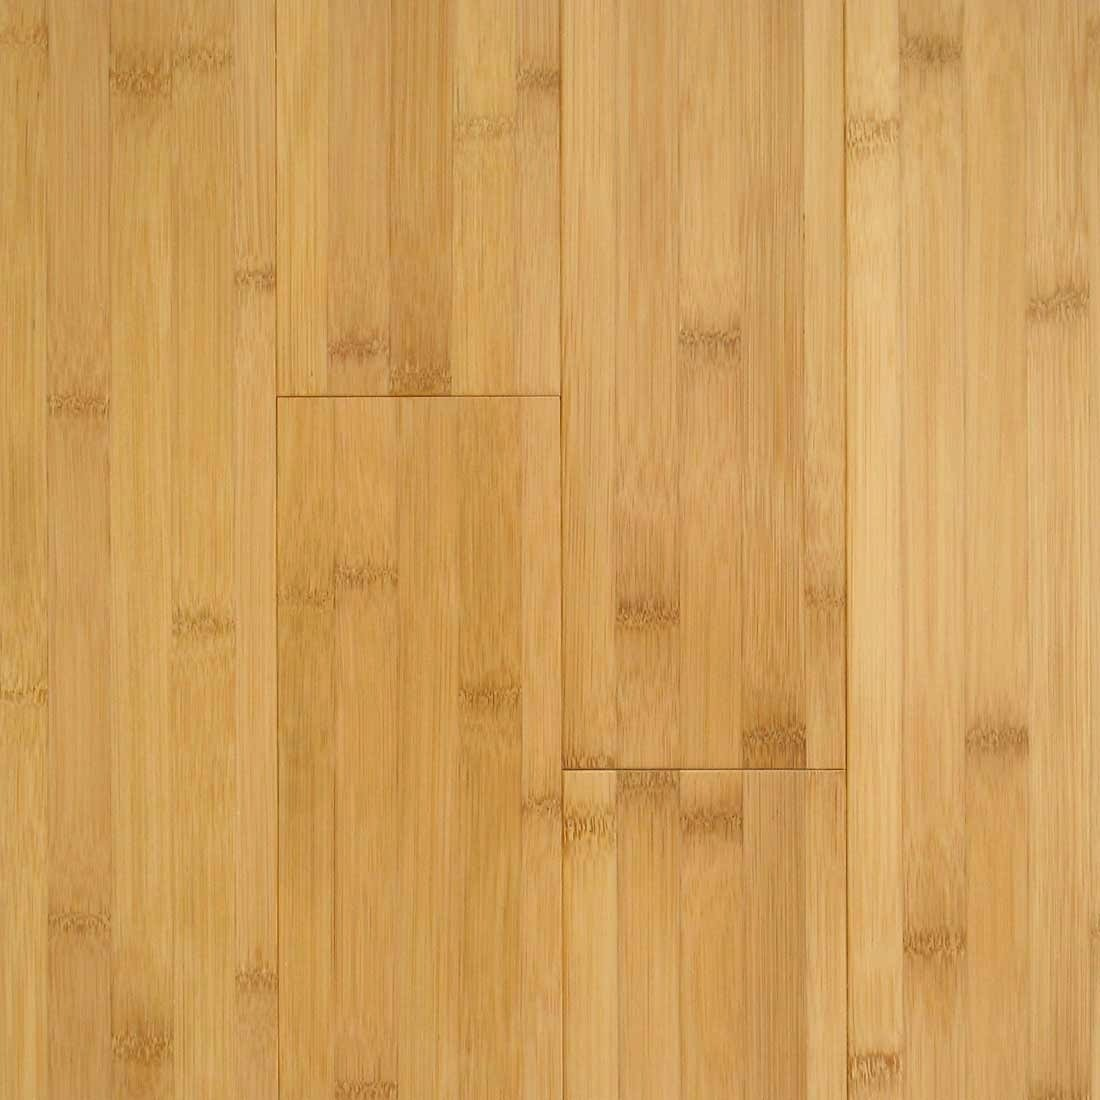 Pisos de madera bamboo bambu piso himwood en for Pisos de bar madera